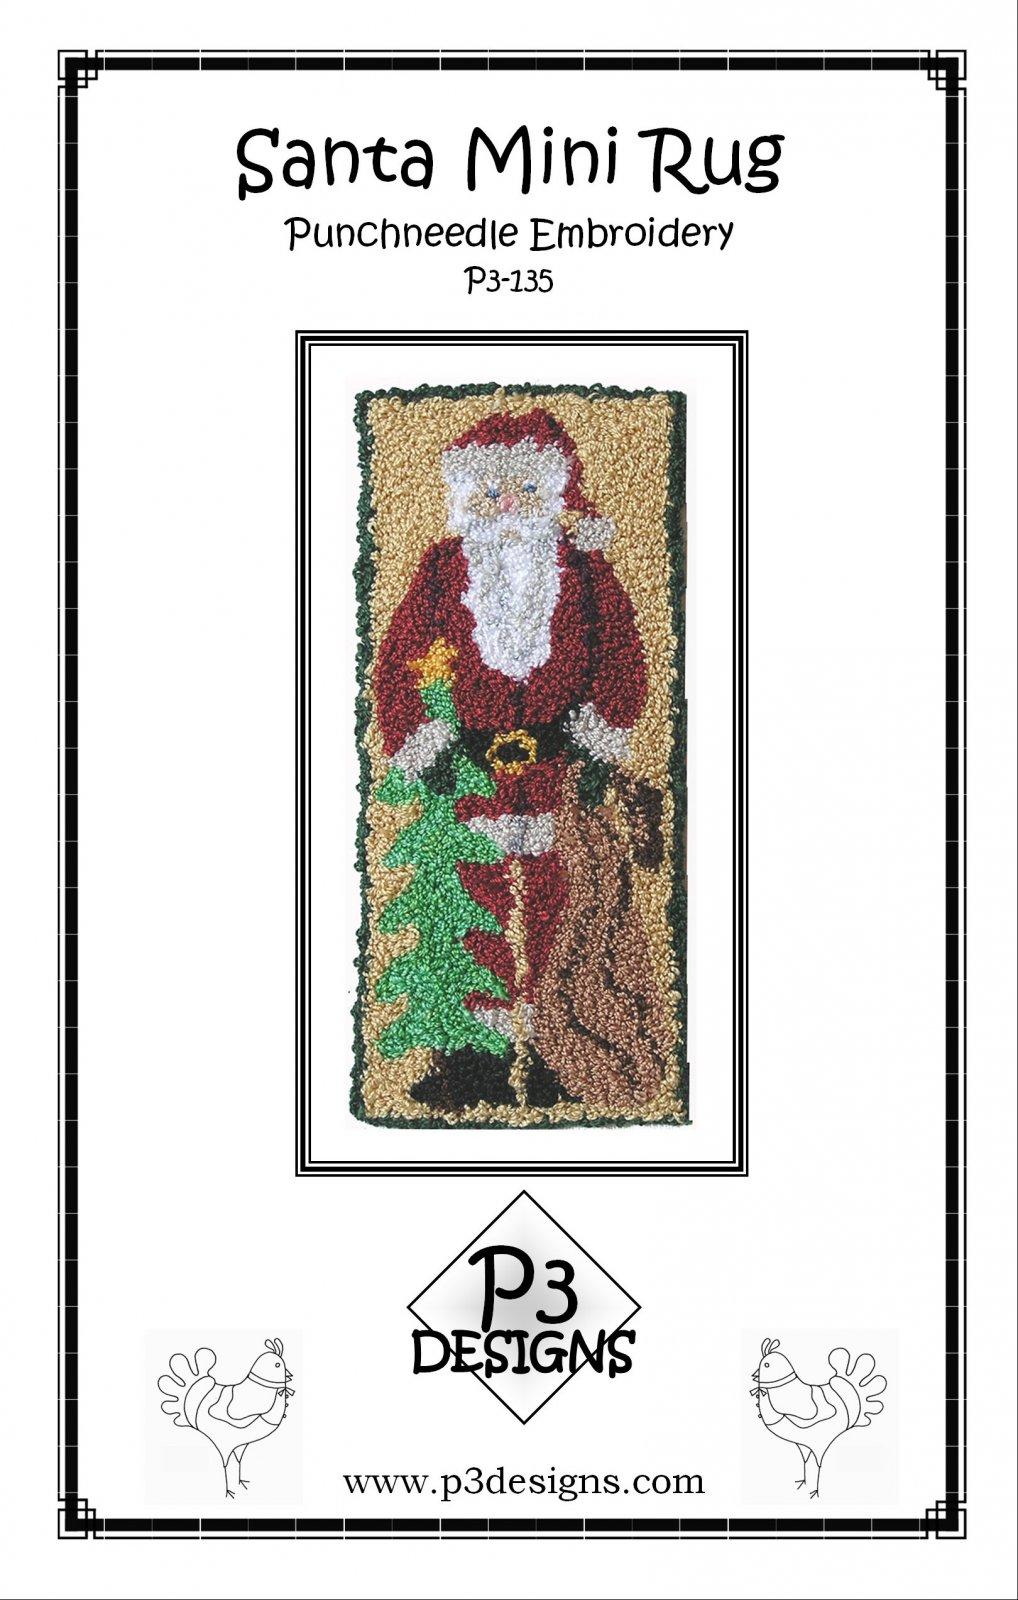 P3-135 Santa Punchneedle mini